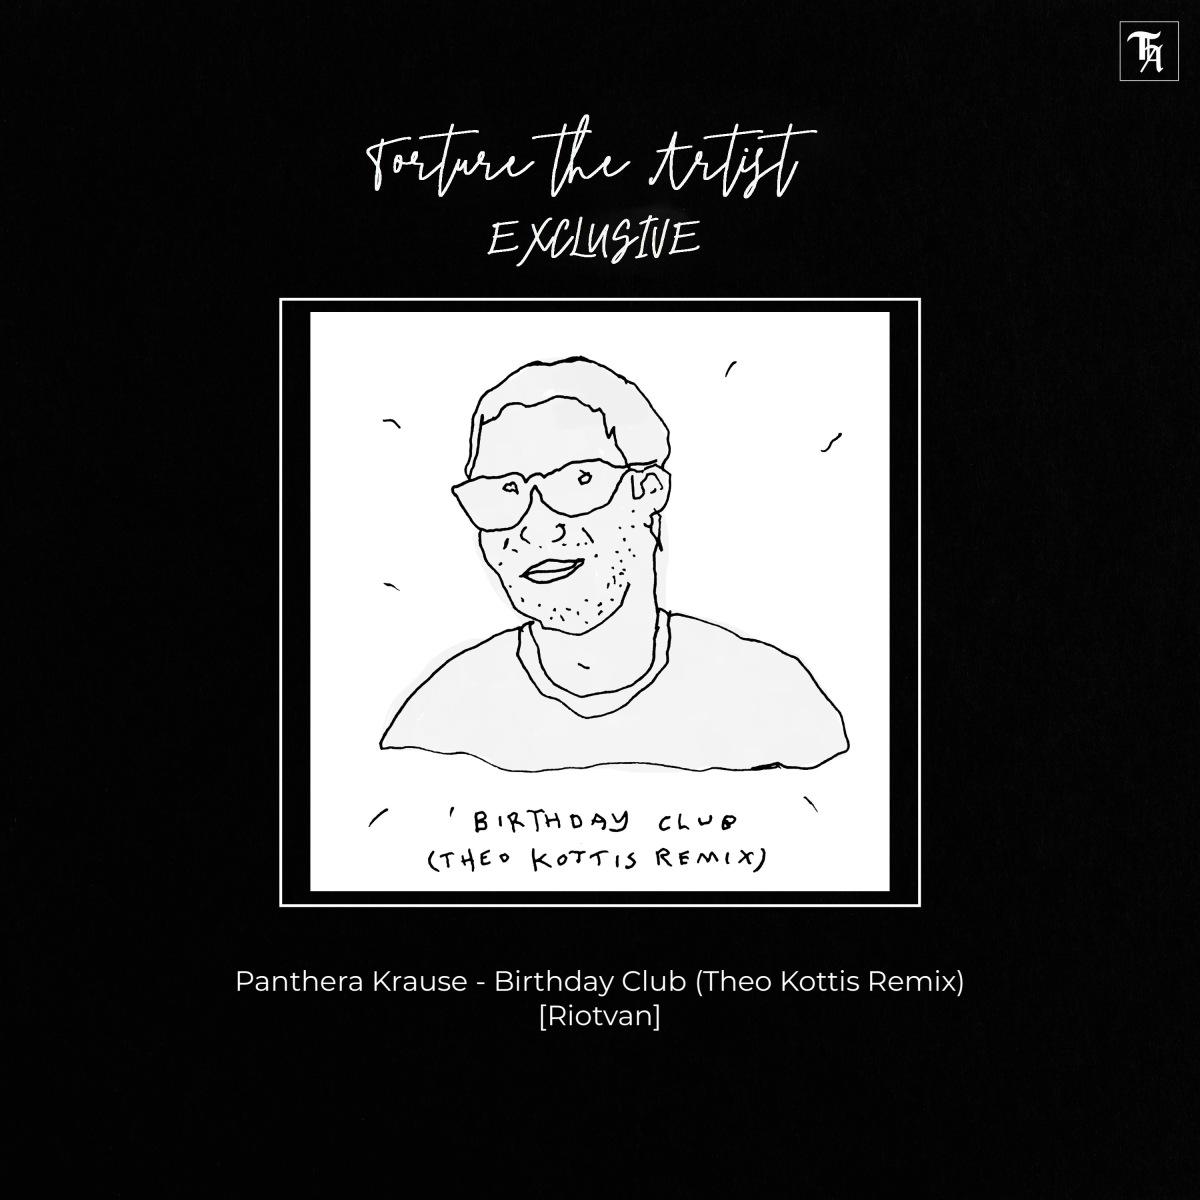 EXCLUSIVE Panthera Krause 'Birthday Club Theo Kottis Remix ...